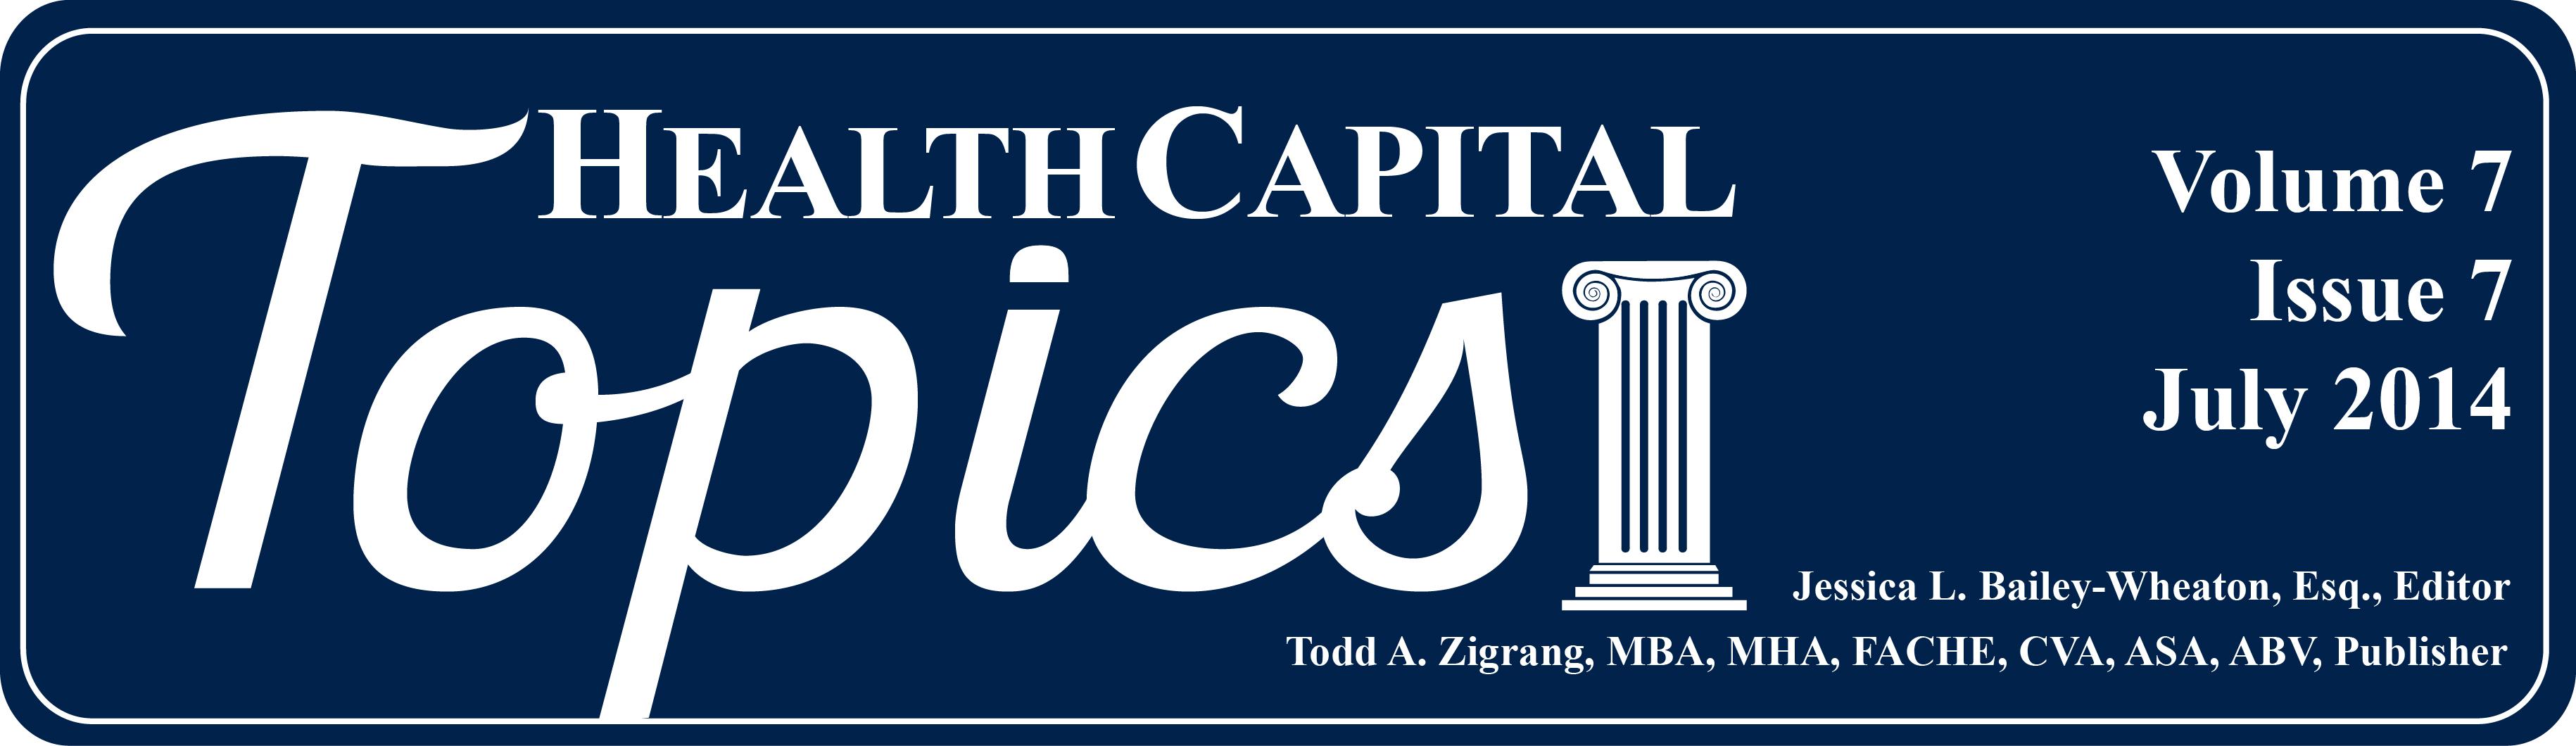 HC Topics Banner Image